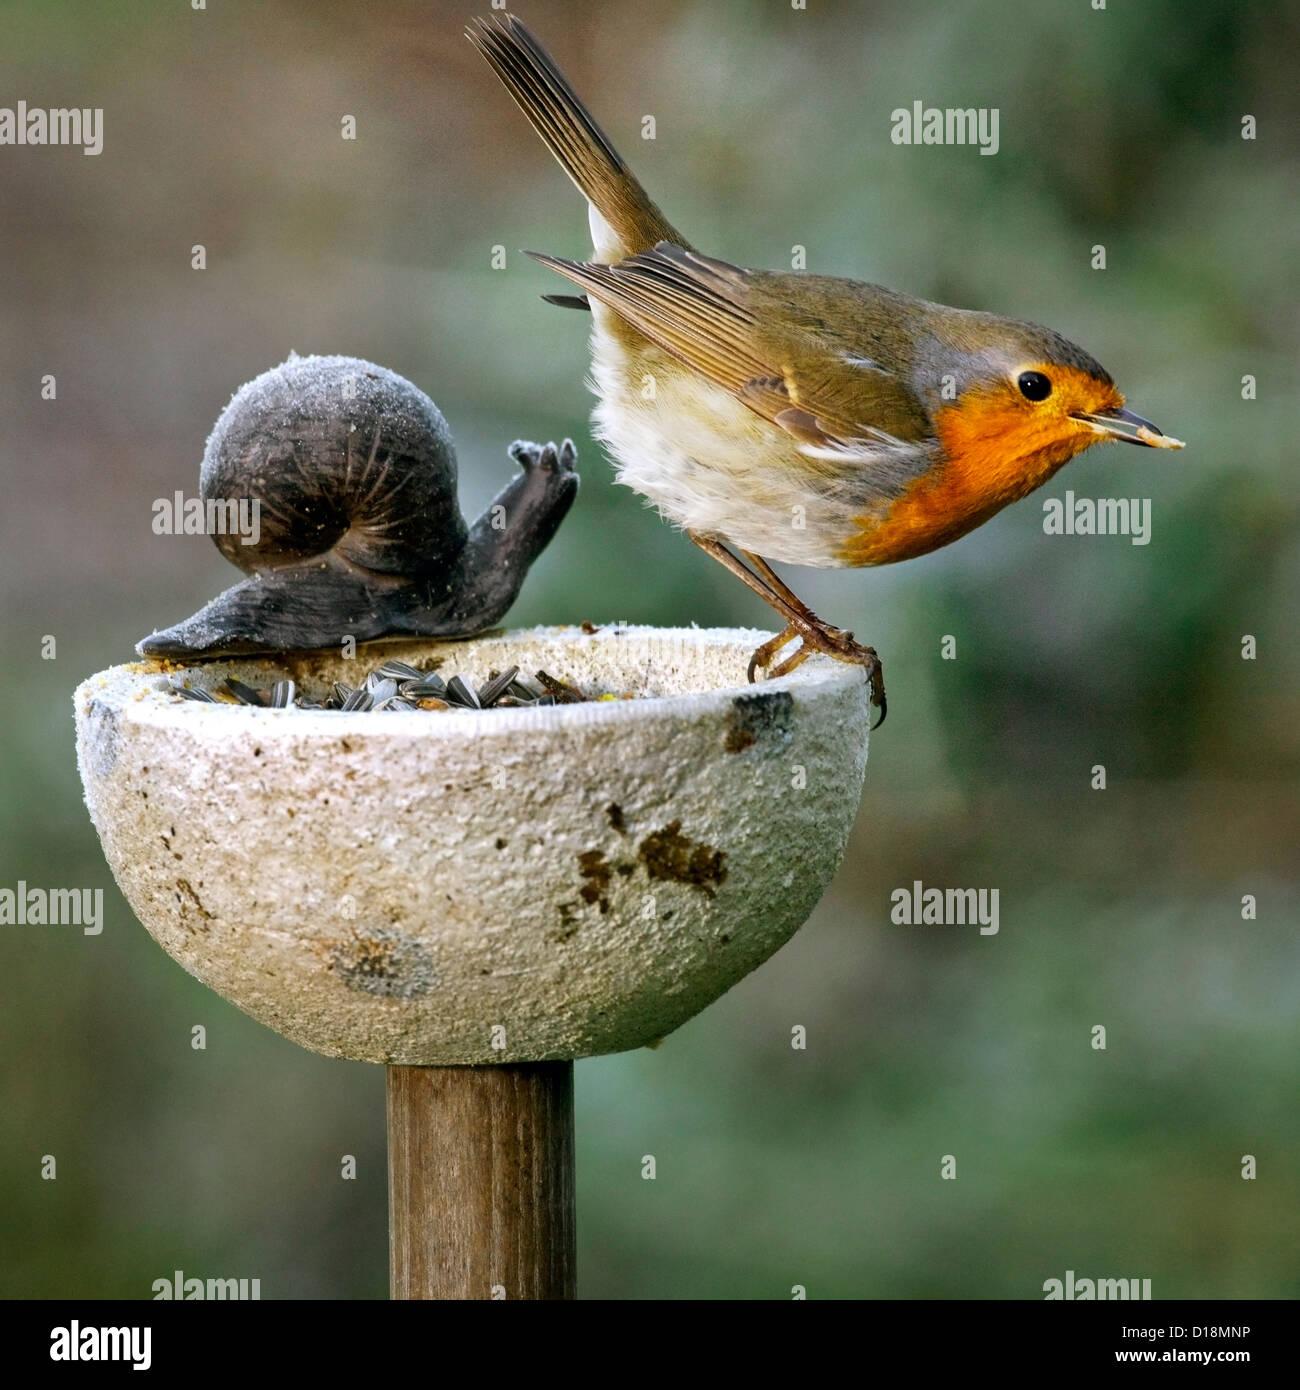 European Robin (Erithacus rubecula) on bird feeder in garden in winter - Stock Image